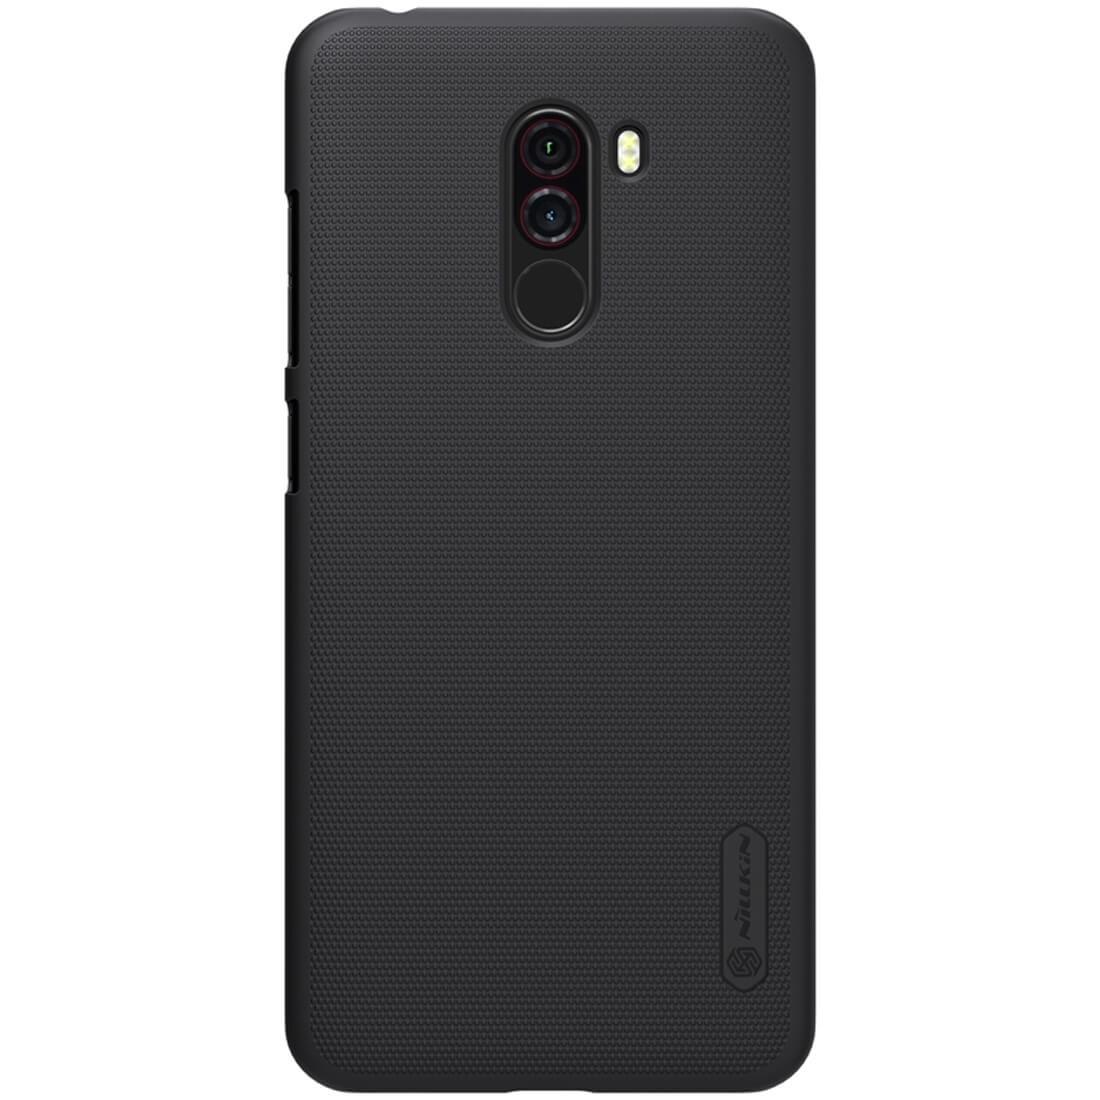 NILLKIN FROSTED obal Xiaomi Pocophone F1 černý